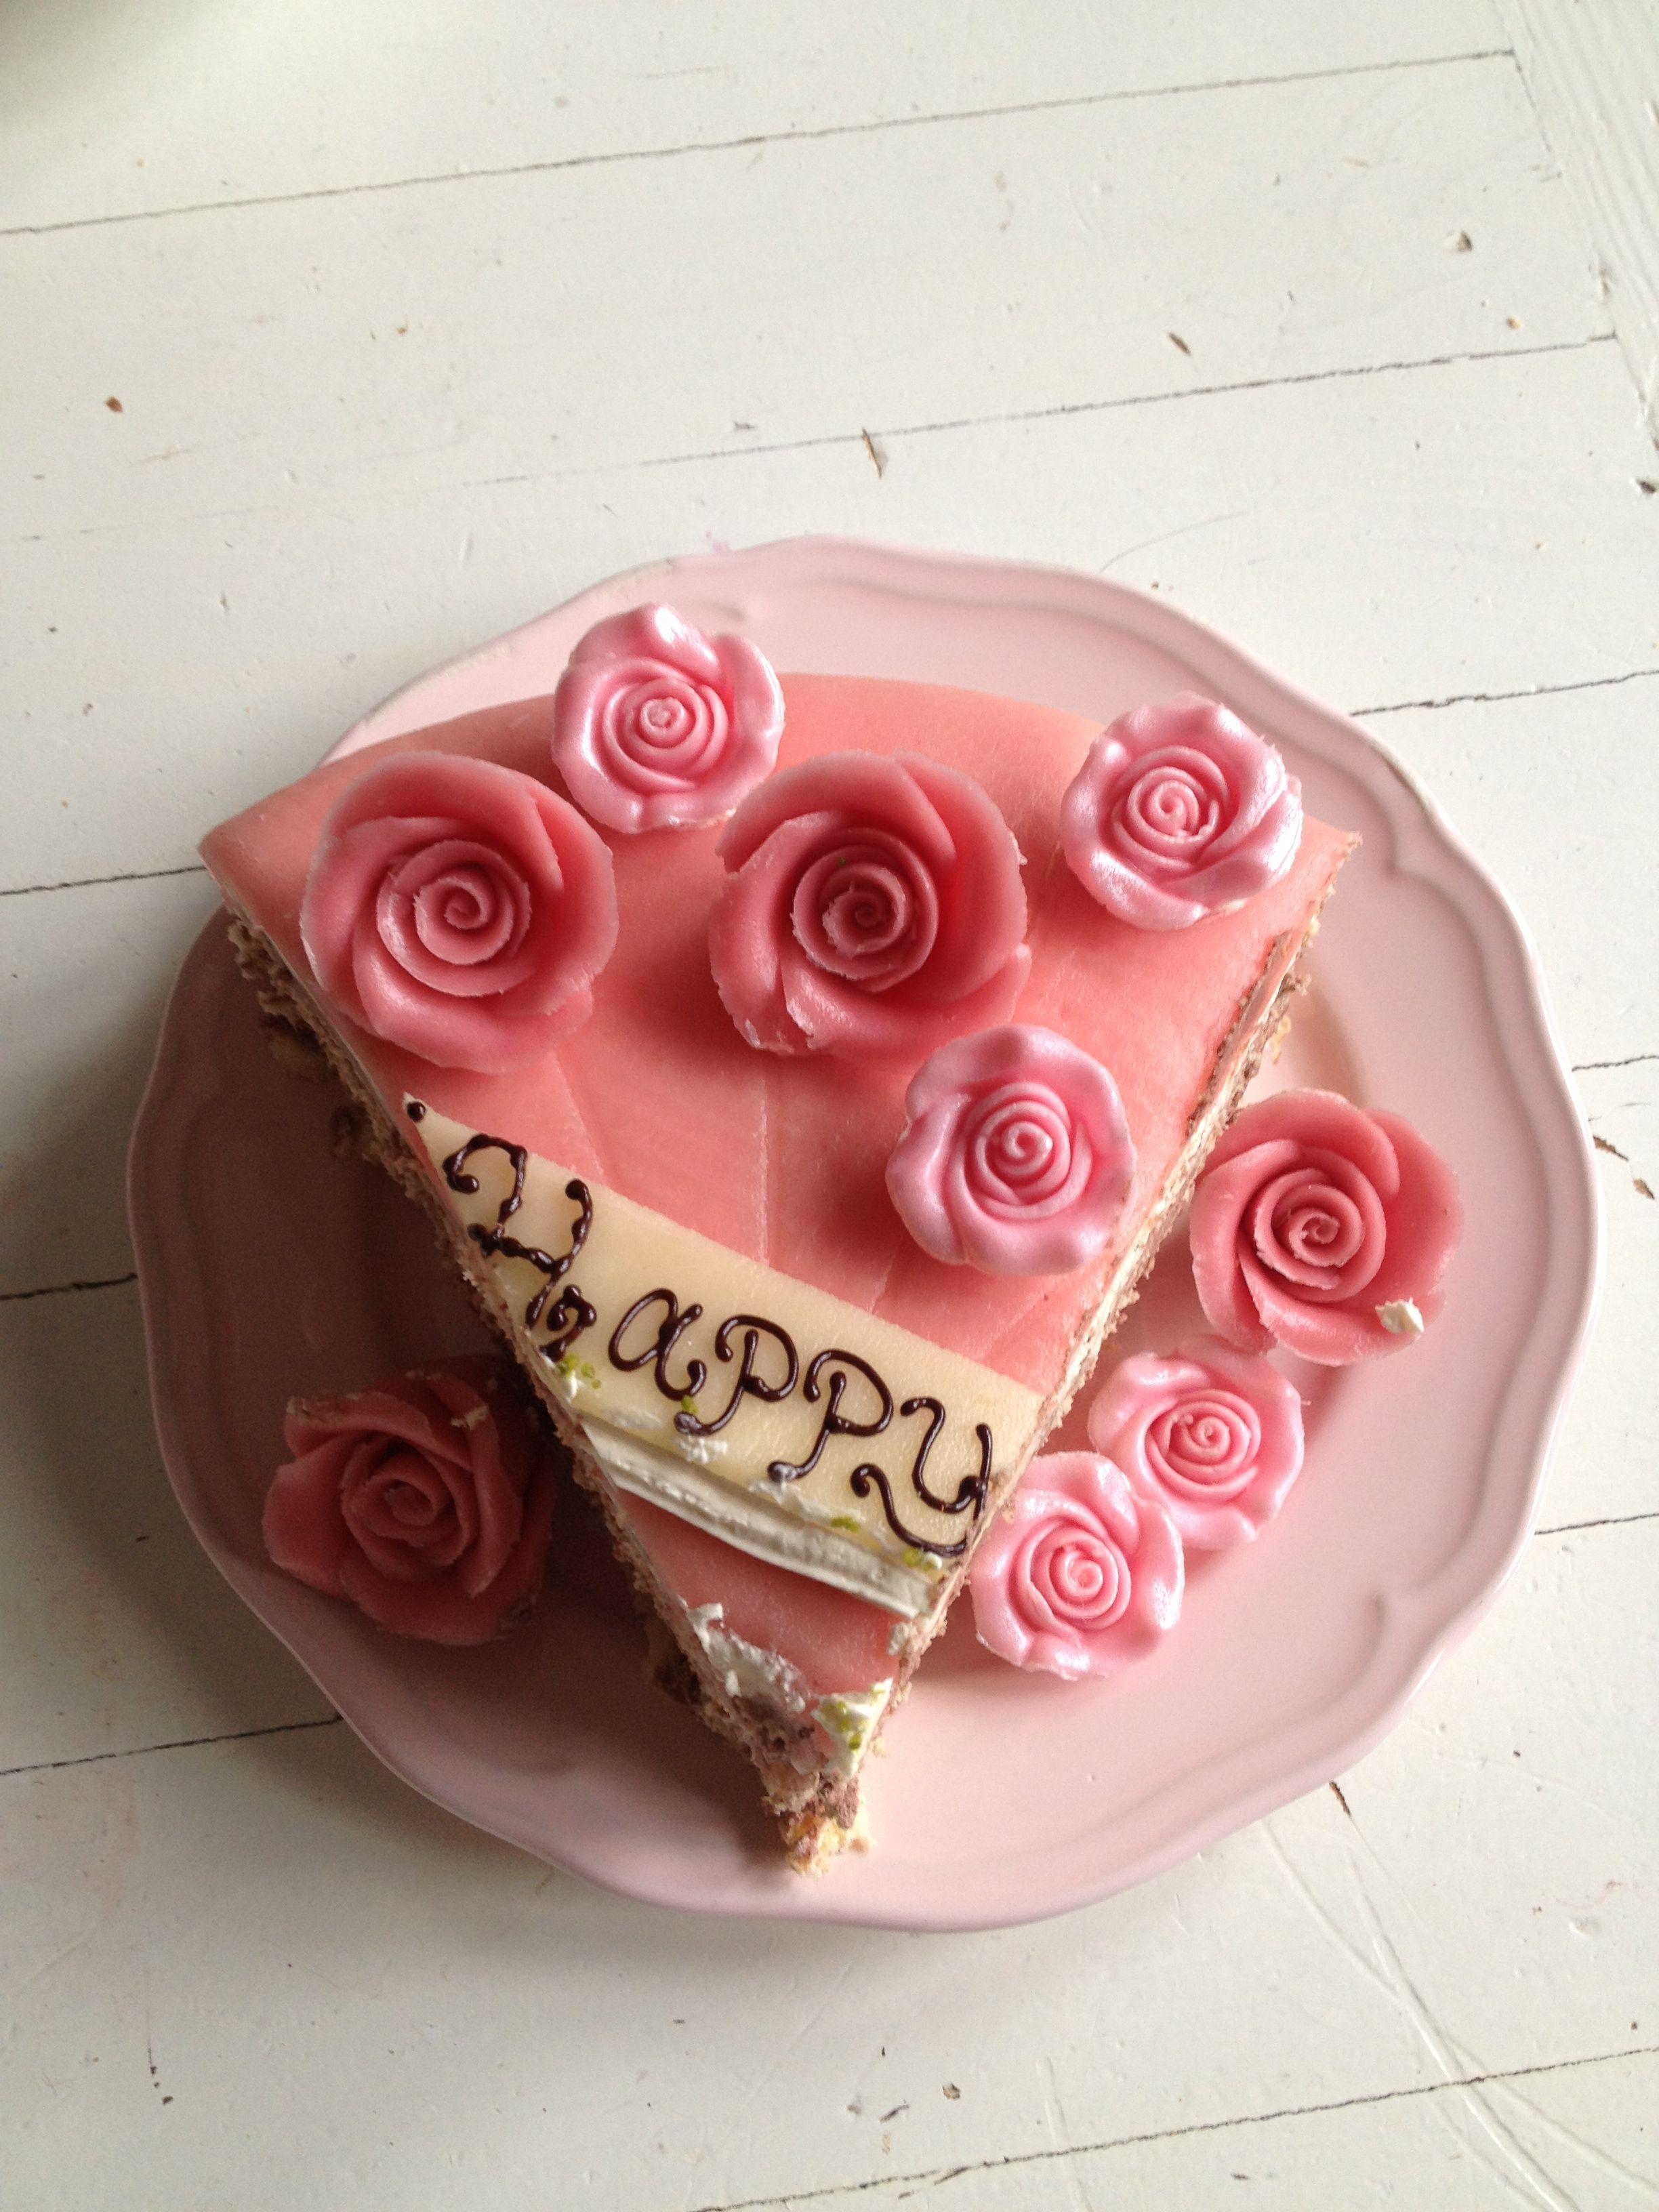 Happy Birthday to meeeee...